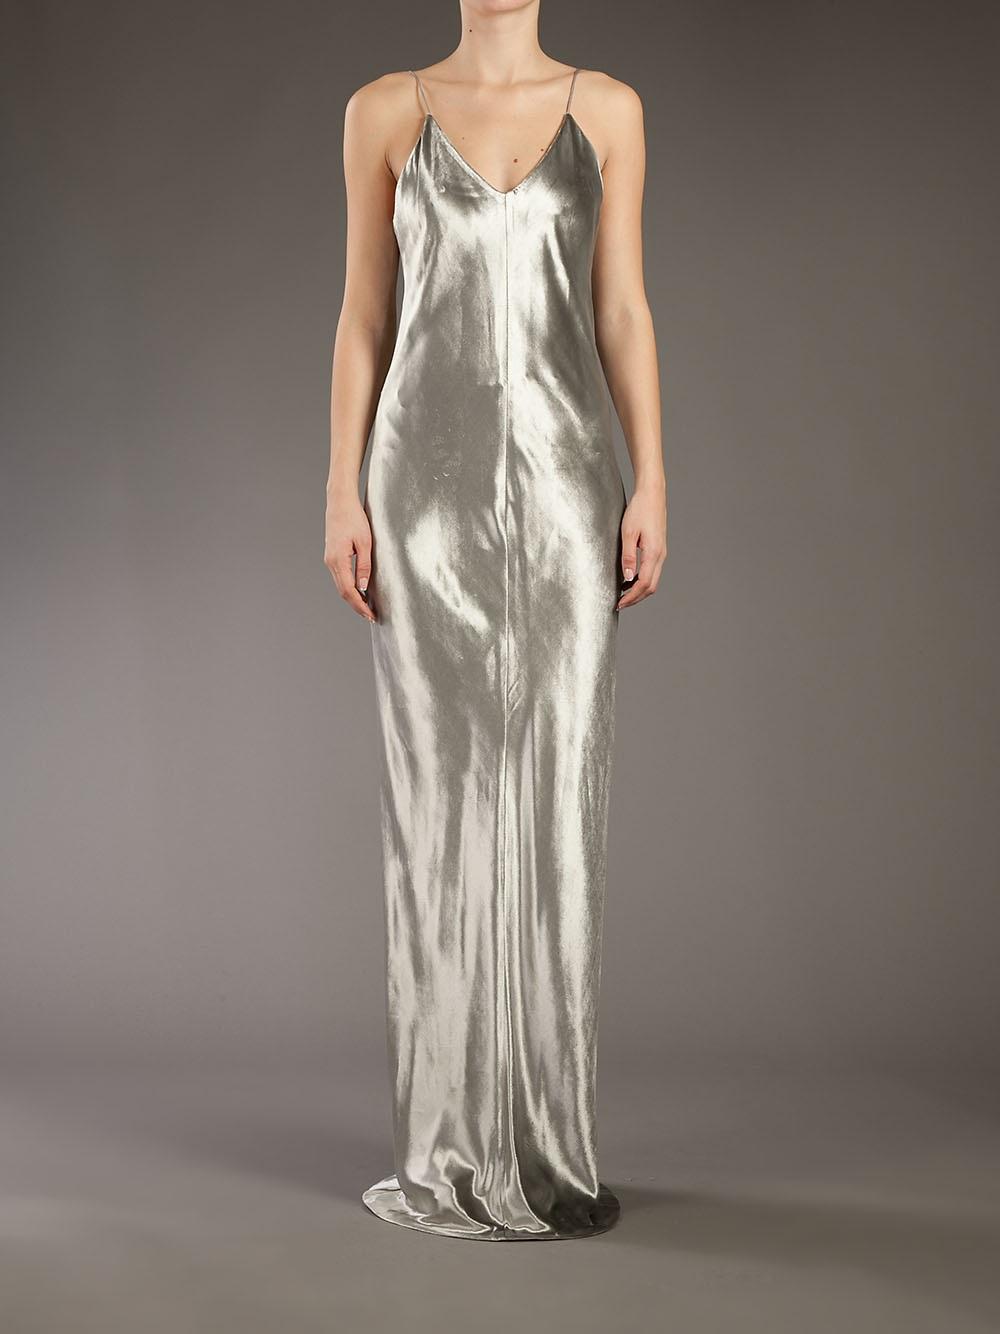 T By Alexander Wang Metallic Evening Dress in Metallic - Lyst